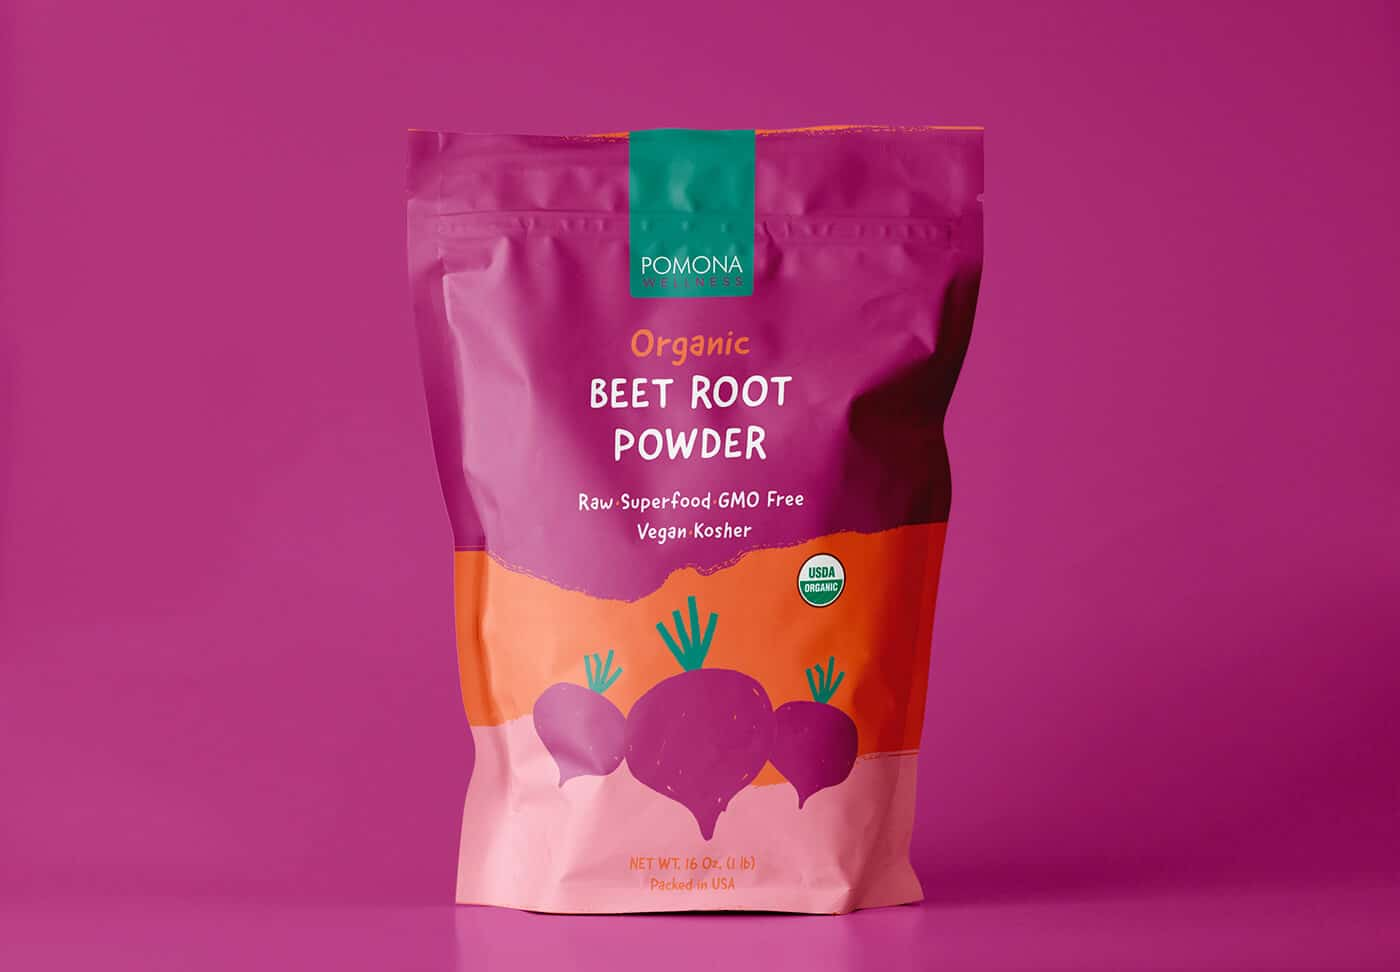 Pomona Powder | Packaging